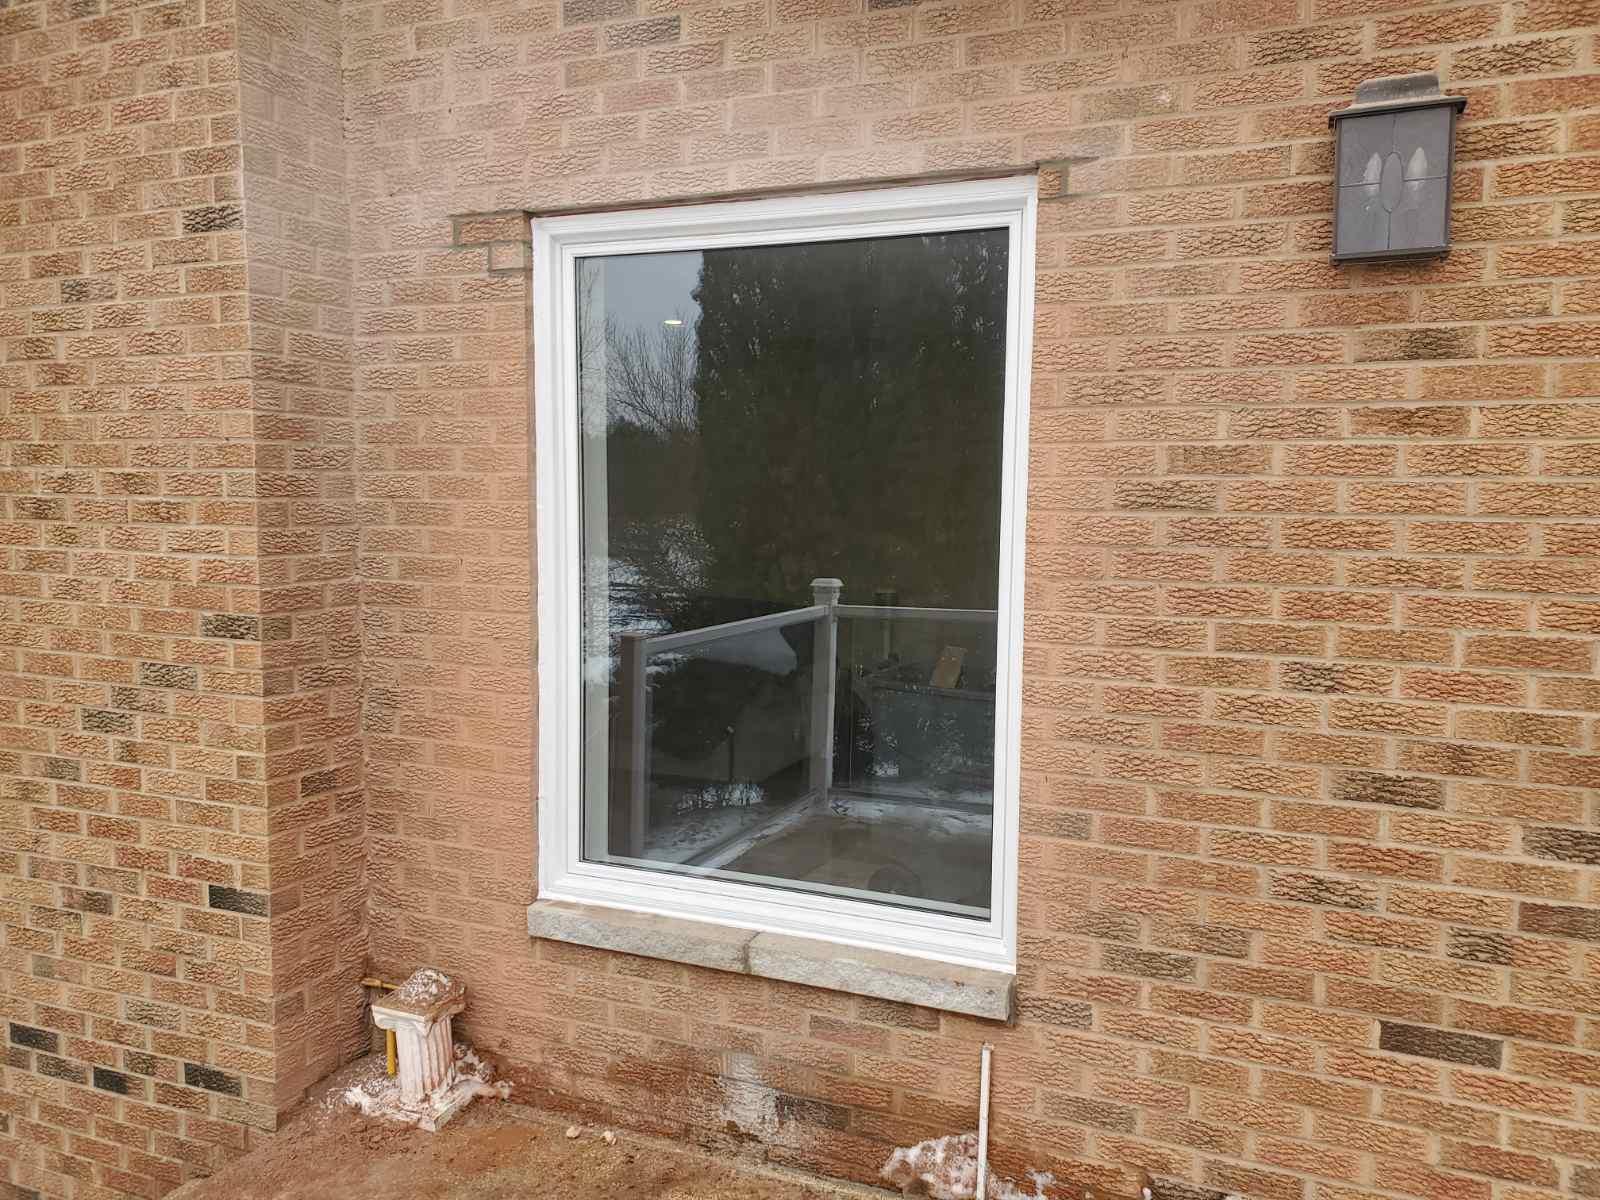 Brick Cutout, Vinyl Trim Installation and Replacement, PVC Windows Woodbridge, Maple, Vaughan, King, Aurora, Nemwarket, Caledon, Nobleton, Kleinburg